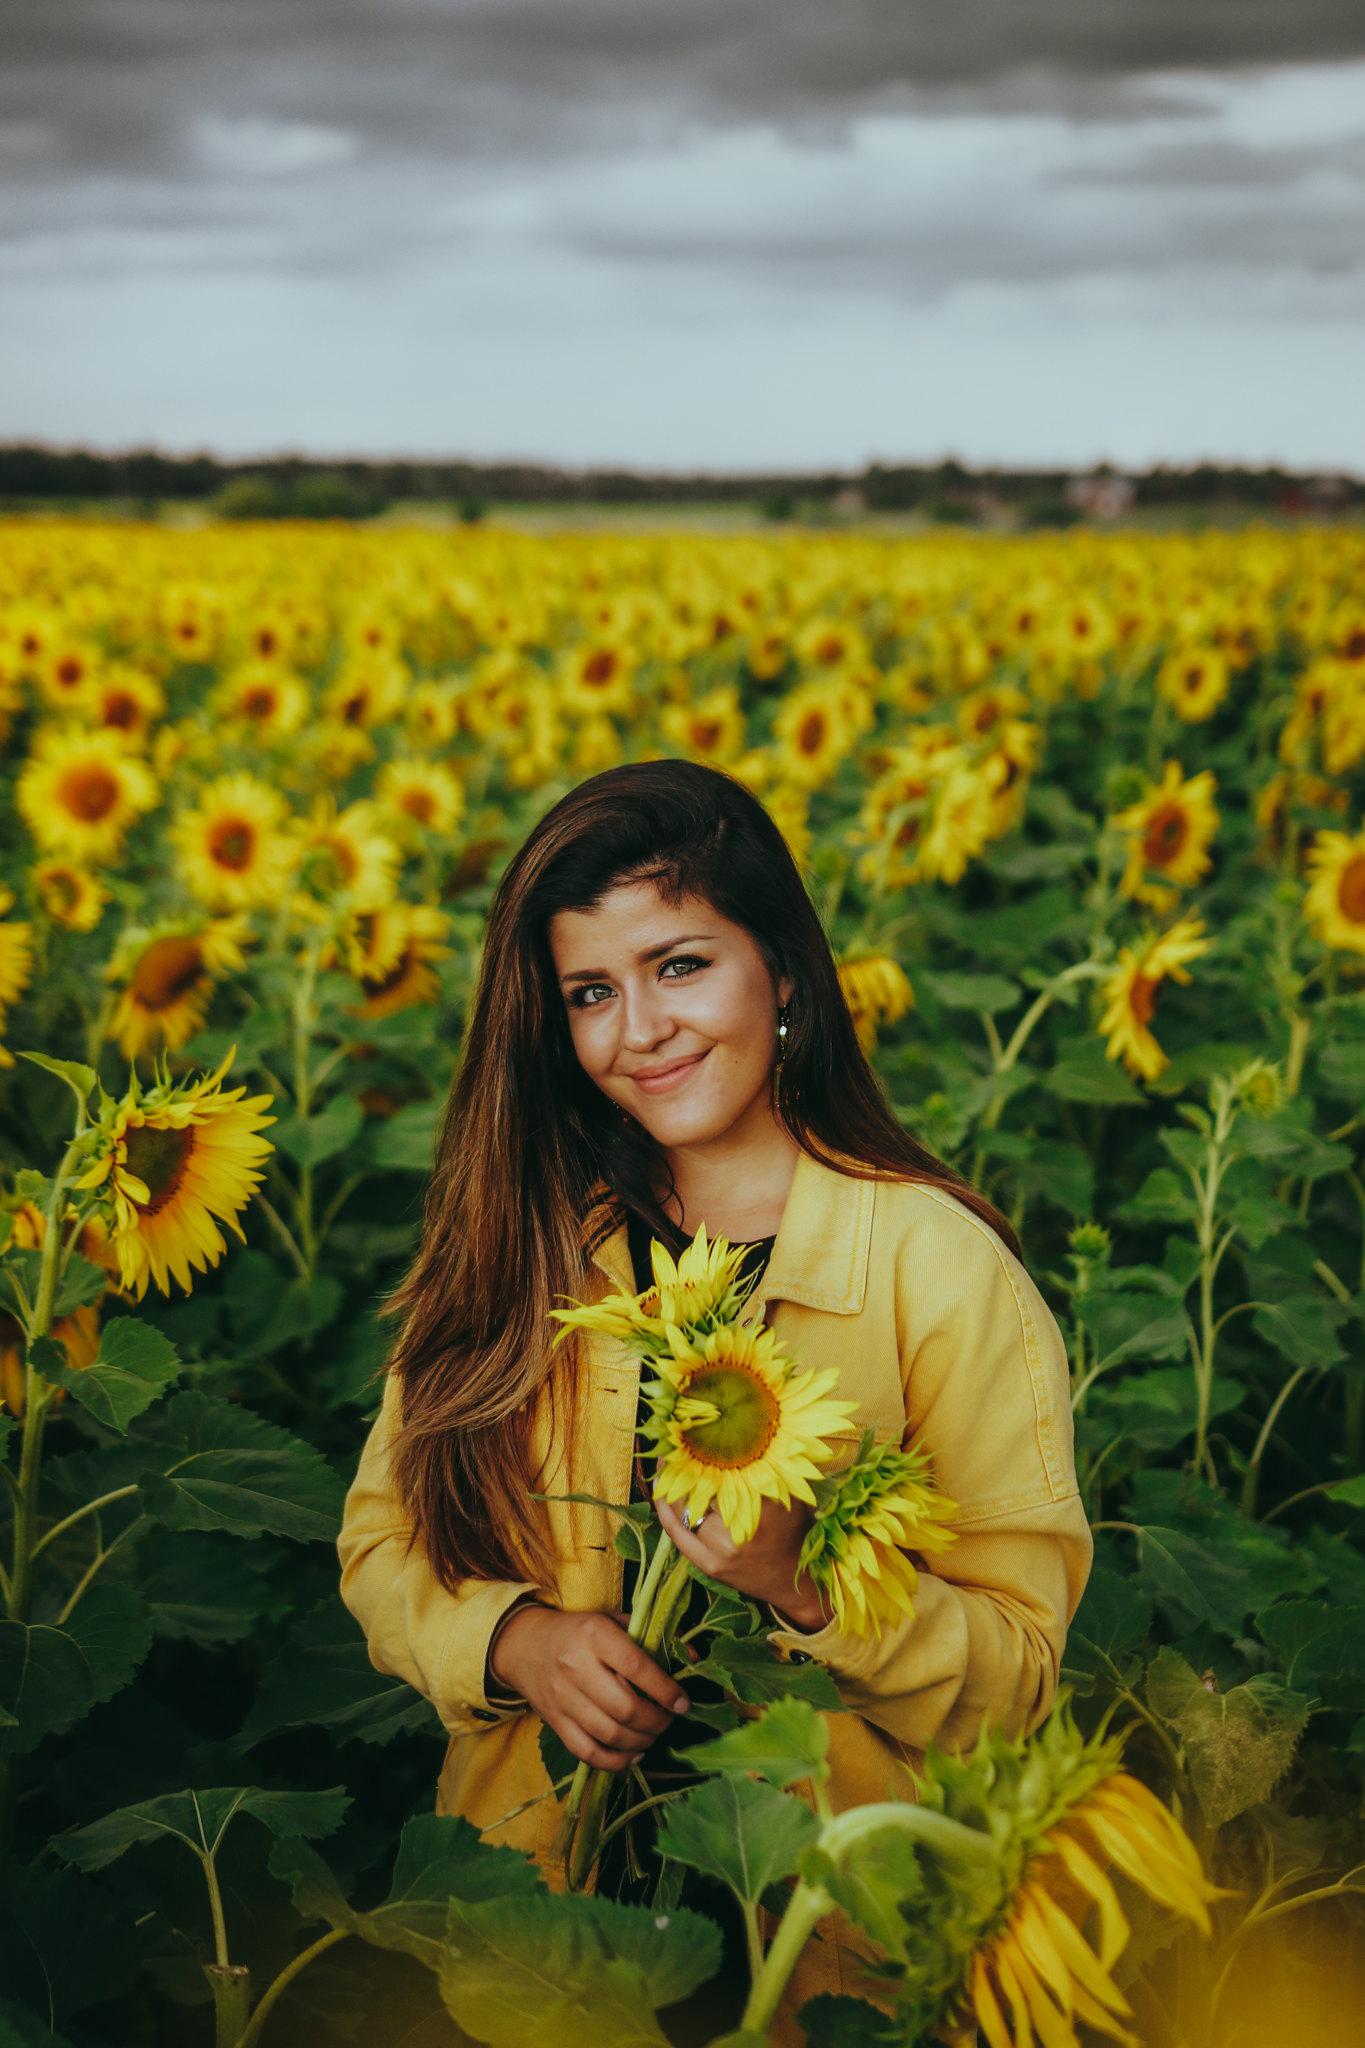 auringonkukkia-18